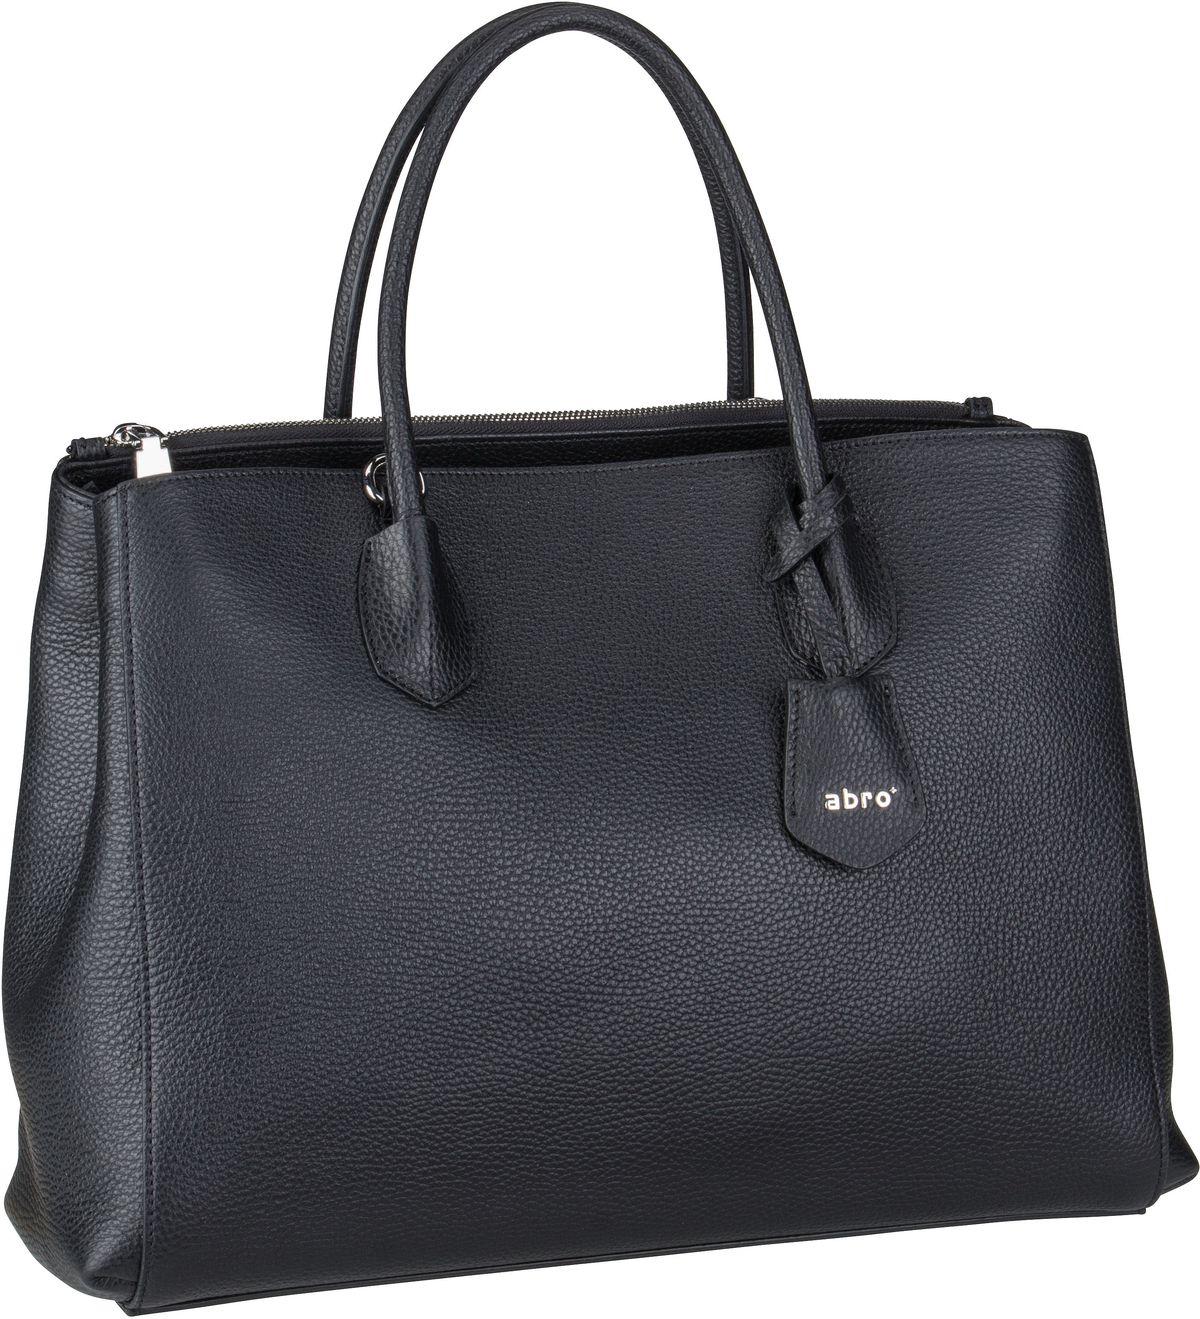 Handtasche Busy 28489 Black/Nickel